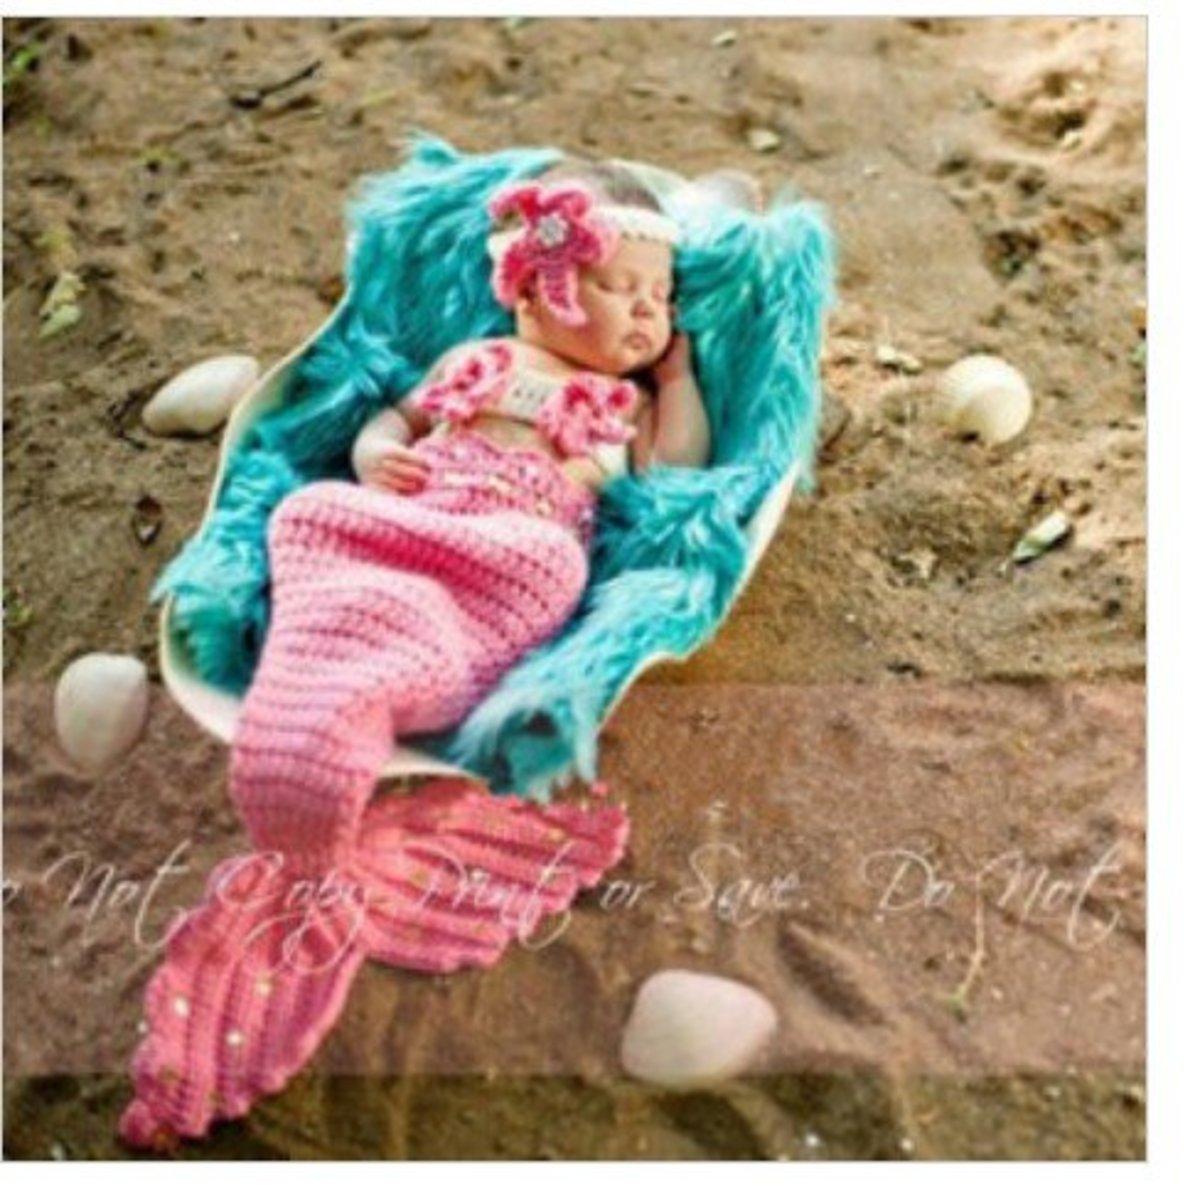 Crochet Pattern For Toddler Mermaid : Baby Mermaid Costume - Crochet Photo Props! Buy it or make it!